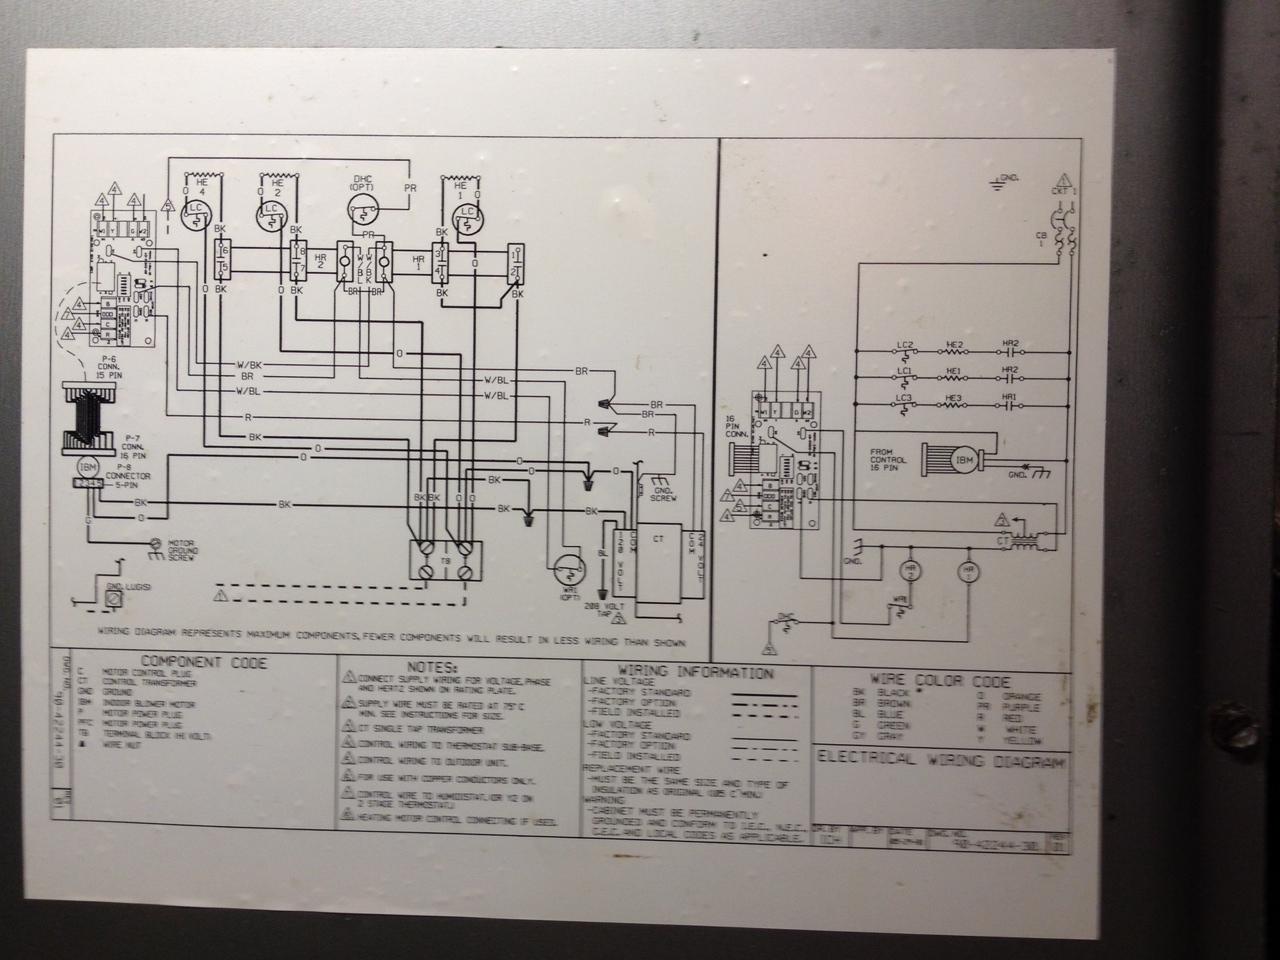 rheem model rbhc-21j11nfc straight kool evaporator fan does not turn on installation  manual on thermostat